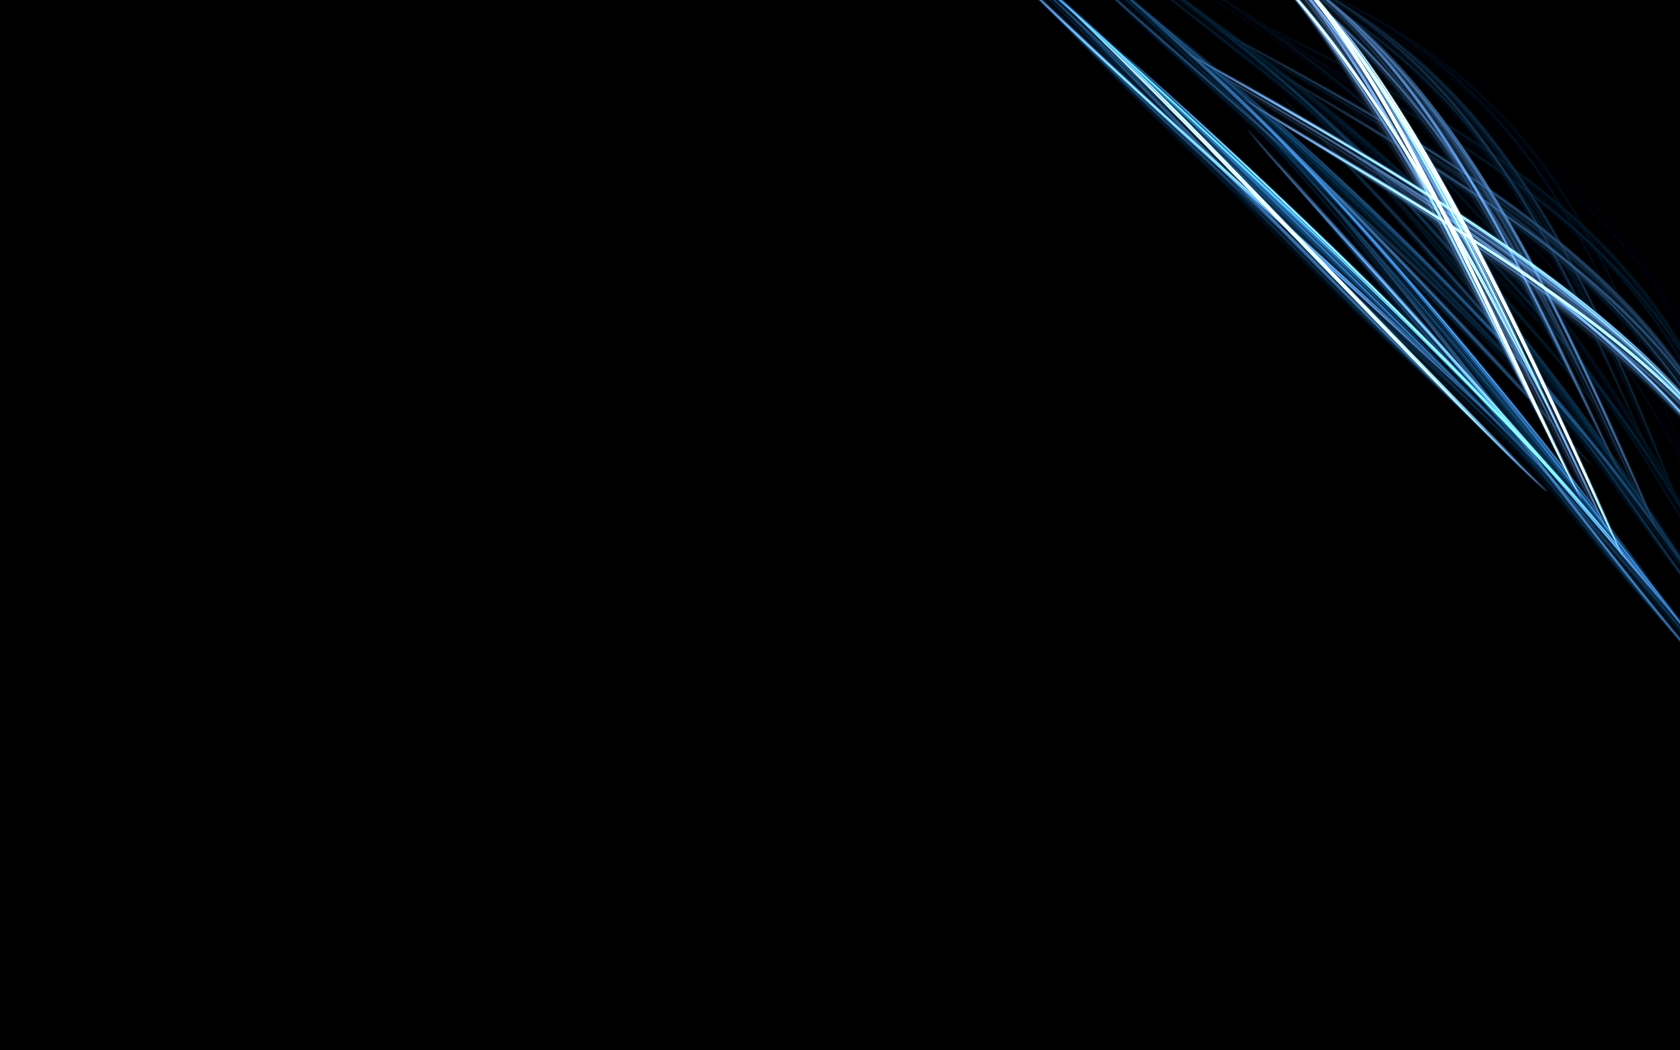 Black And Blue Wallpaper Search Results newdesktopwallpapersinfo 1680x1050